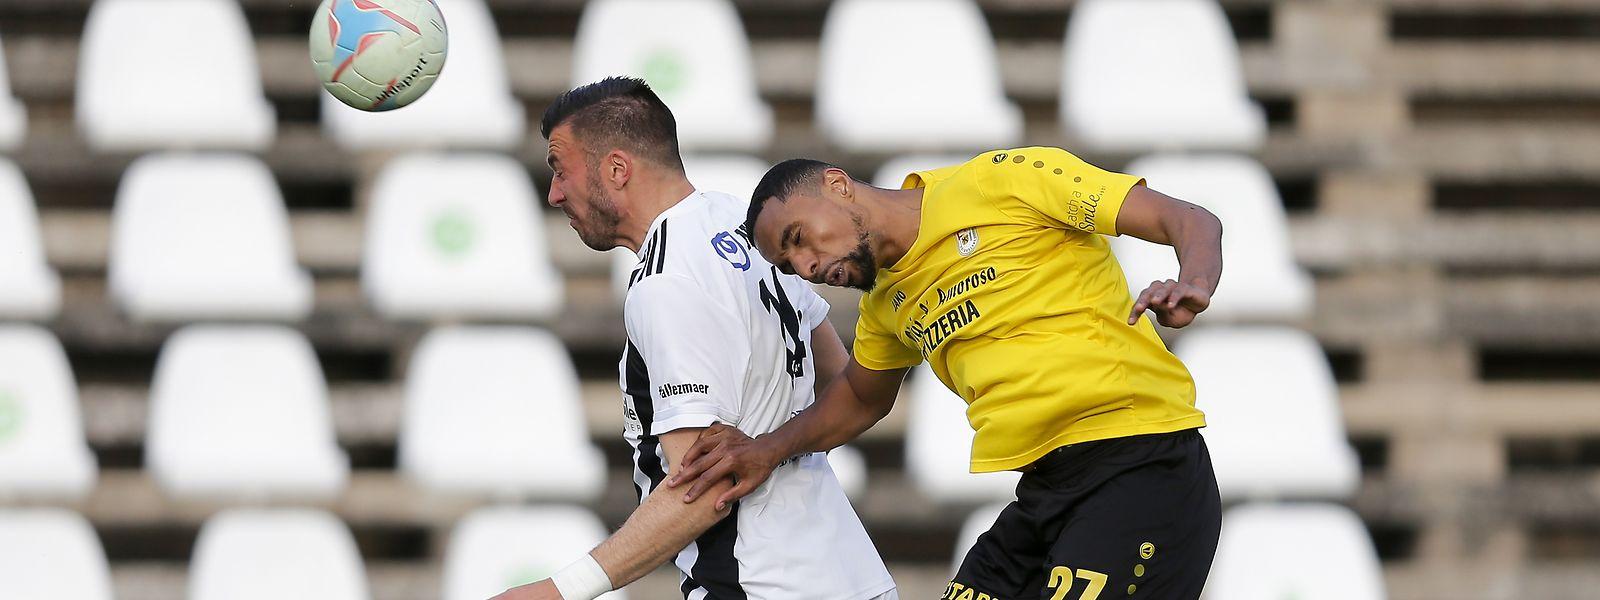 Düdelingens Adel Bettaieb (r.) kämpft mit Xavier Tomas (Jeunesse) um den Ball.